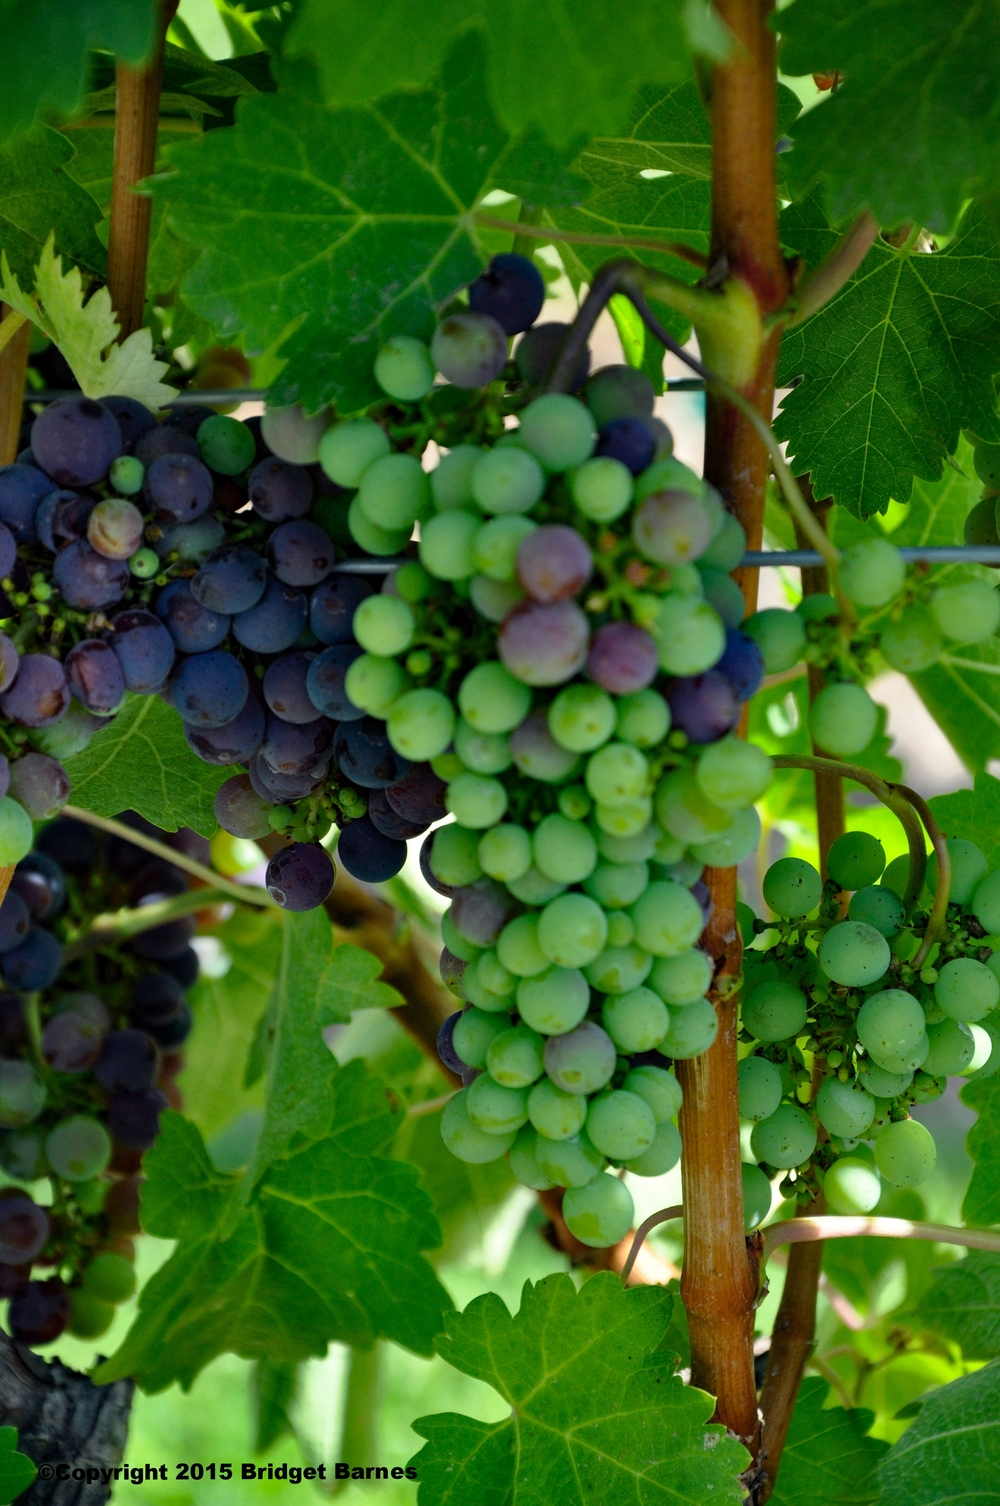 Grapes in Solvang, California  ©Copyright 2015 Bridget Barnes